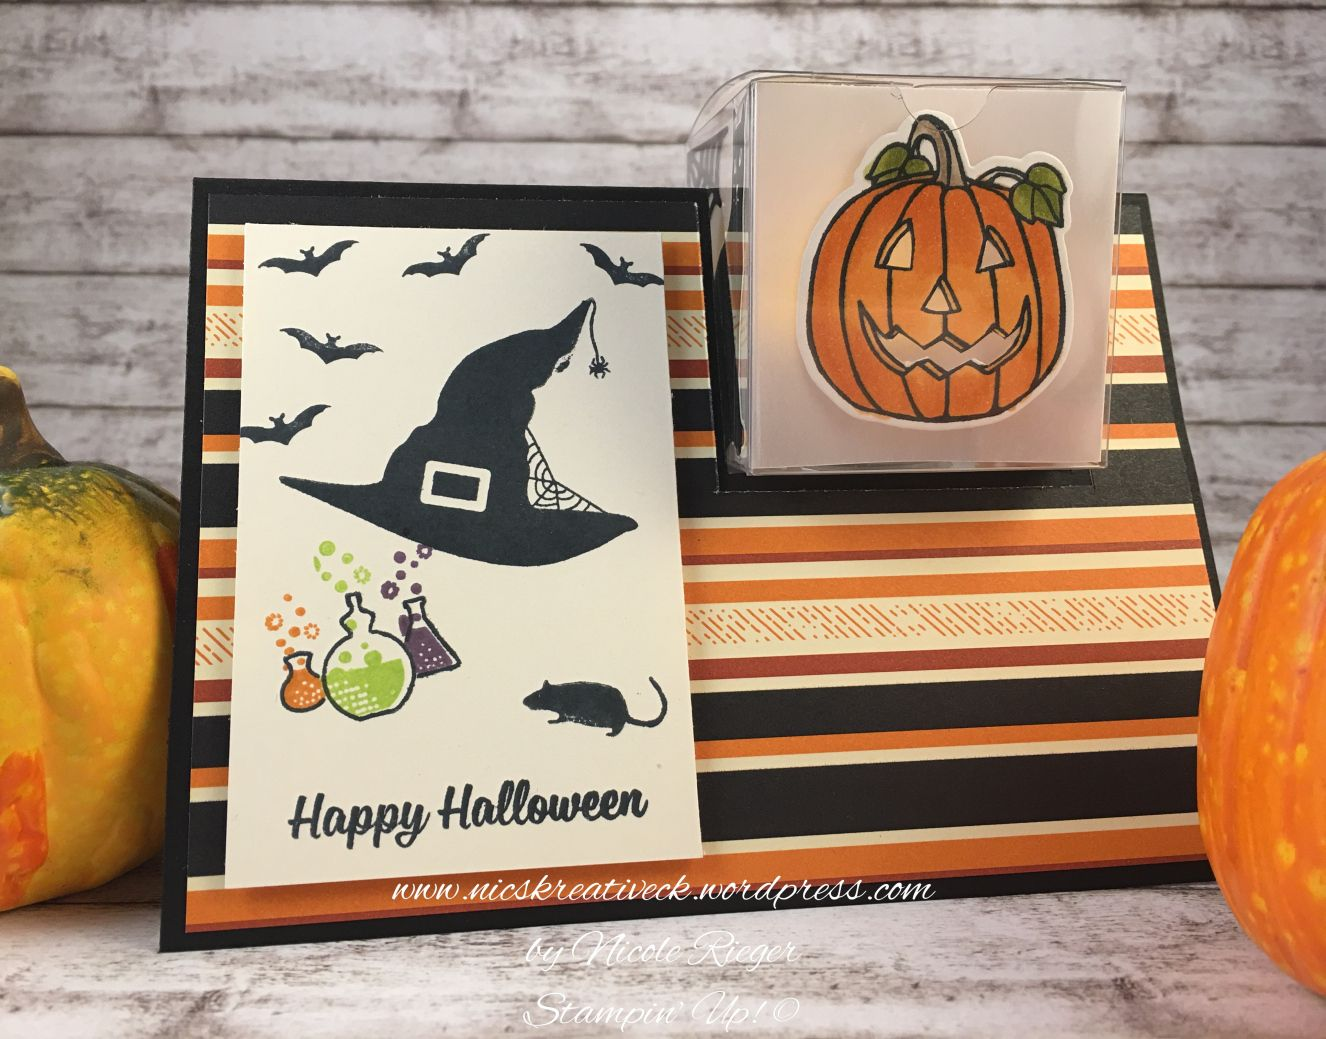 Partner Kostüme Halloween Ideen Best Of Halloween Box In A Card Cards Basteln Halloween Halloween